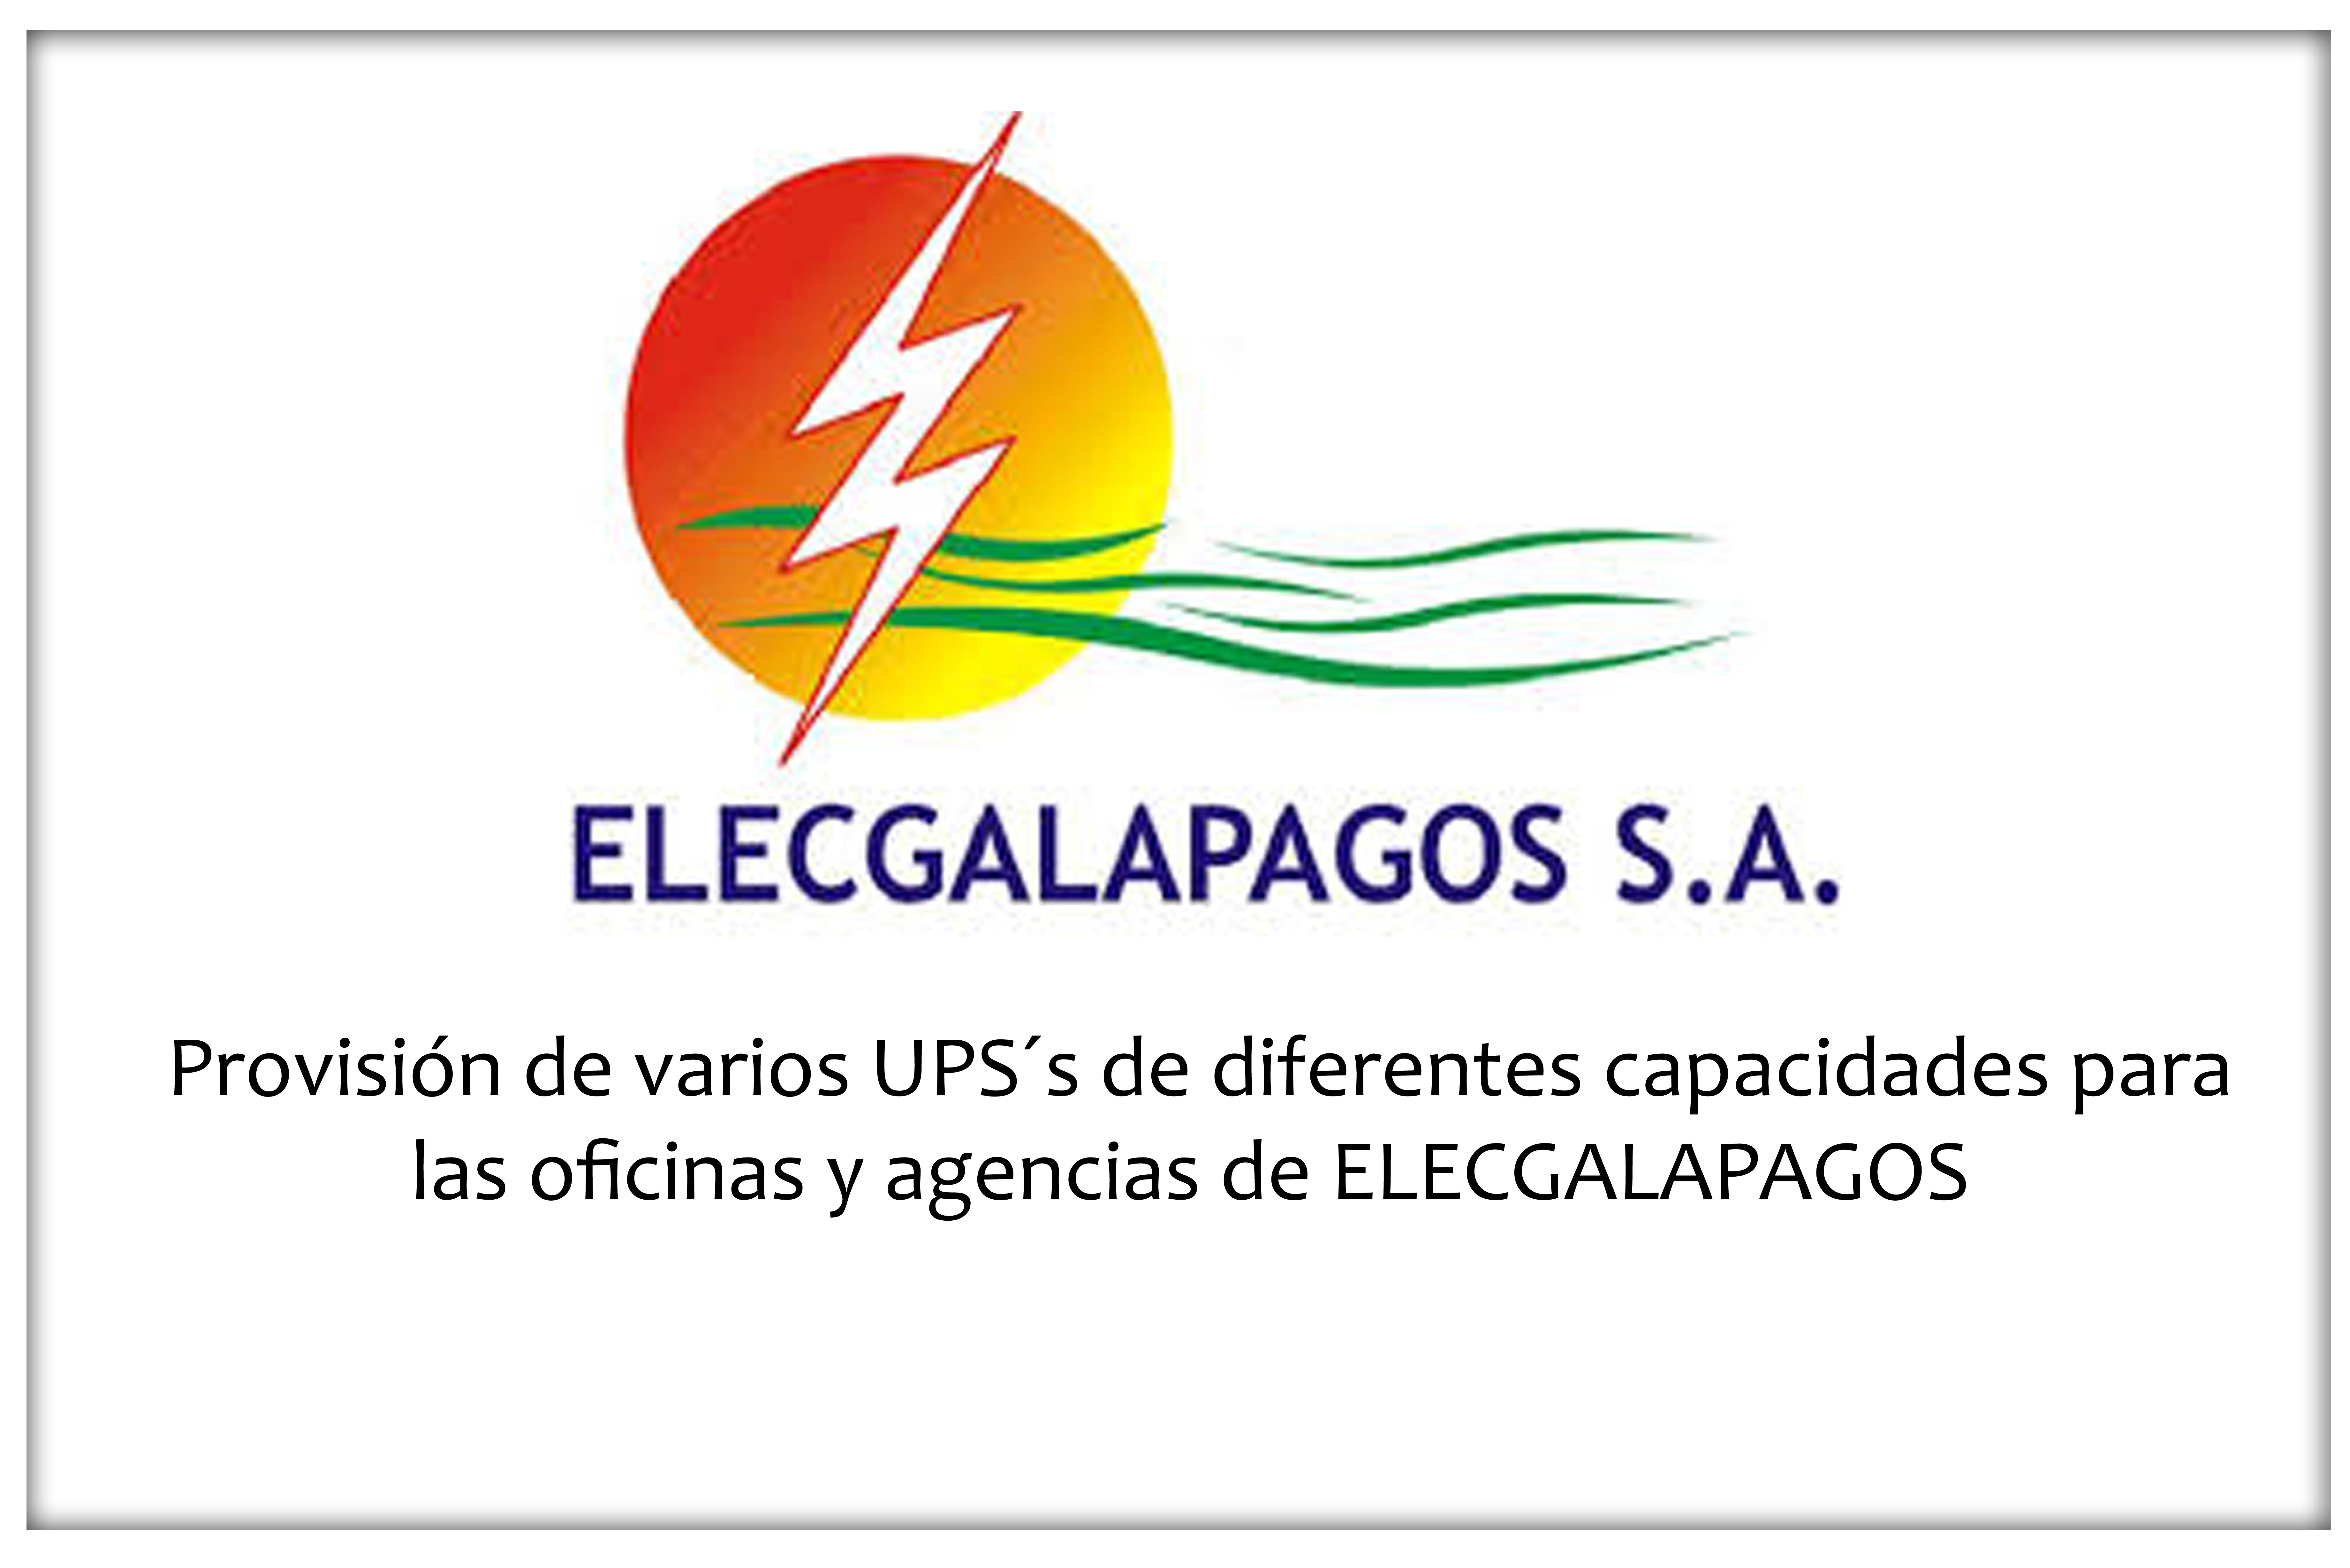 ELEGALAPAGOS